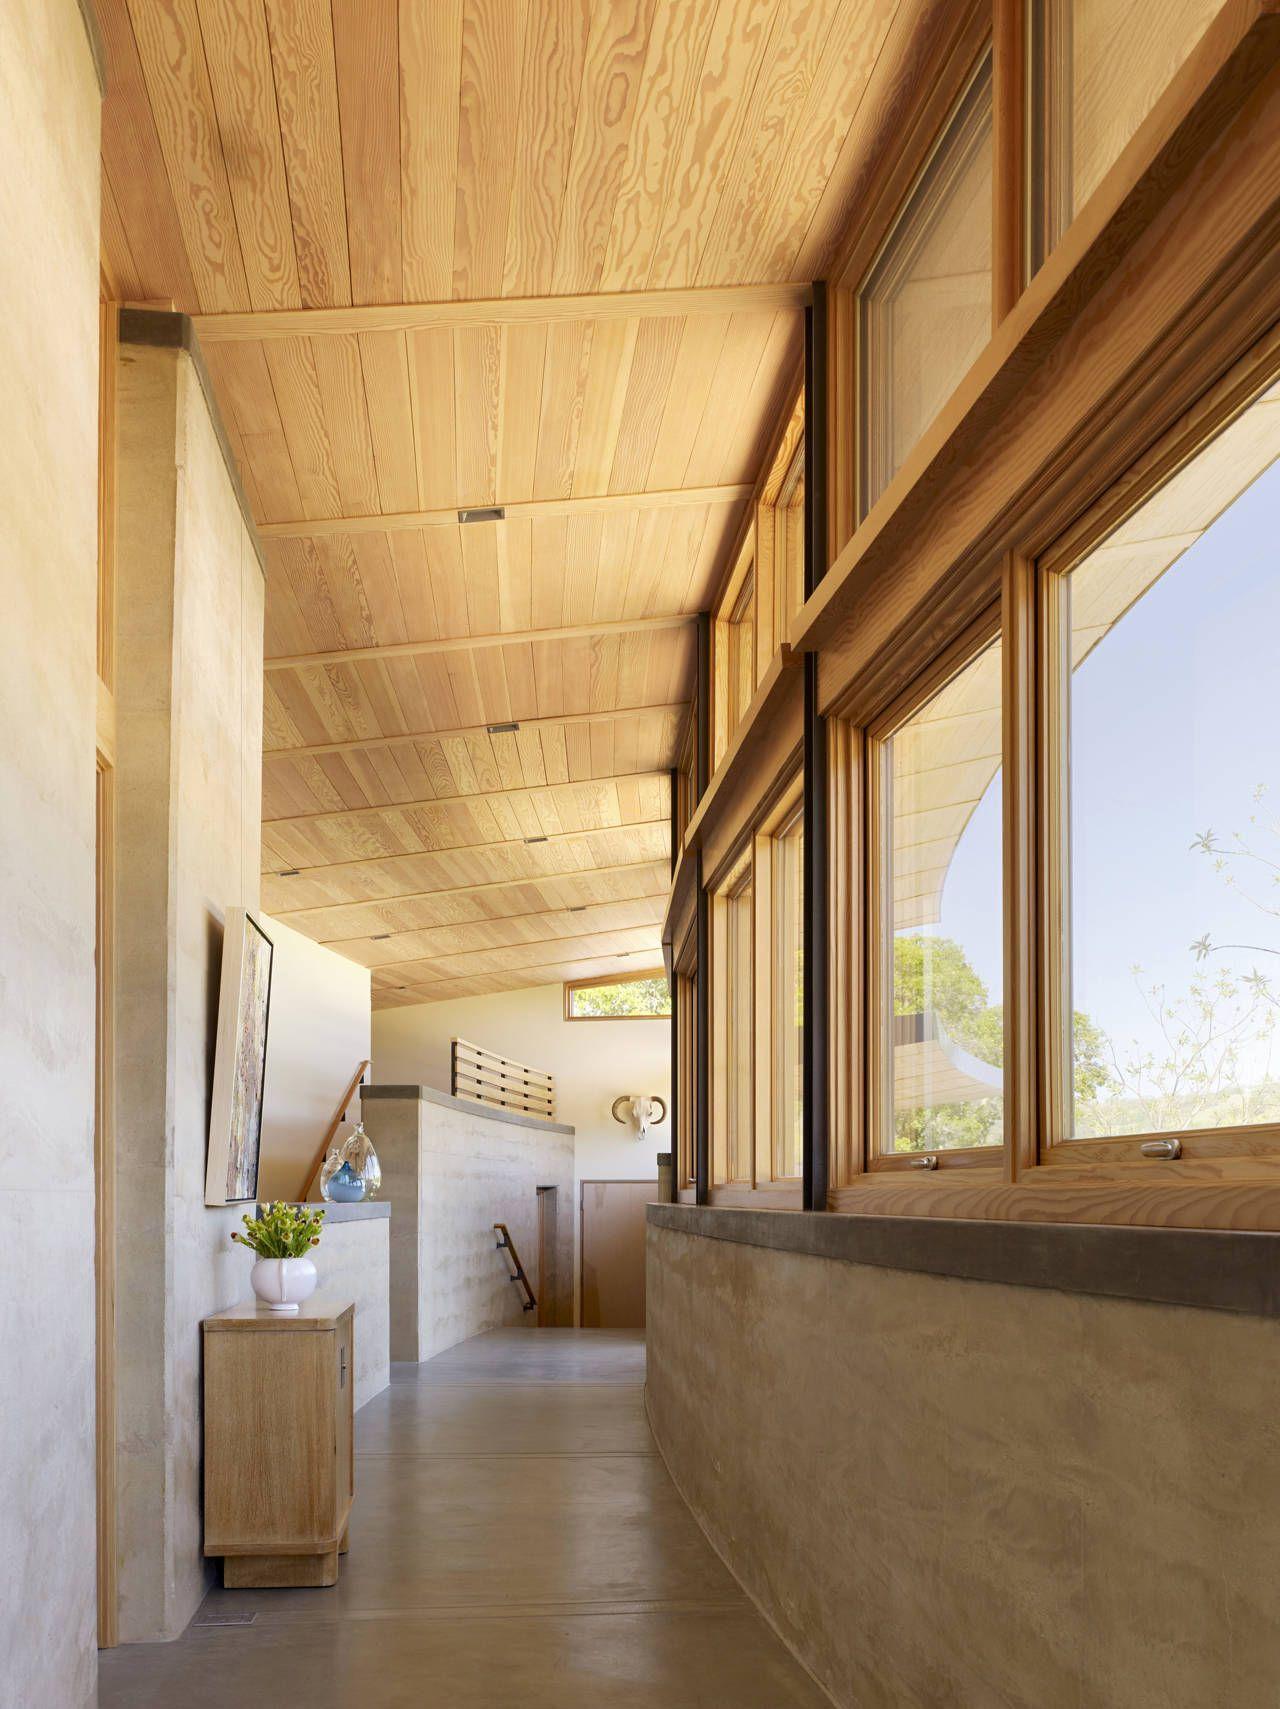 Exposed Concrete Walls Ideas Inspiration: Hallway, Exposed Concrete Walls, Caterpillar House In